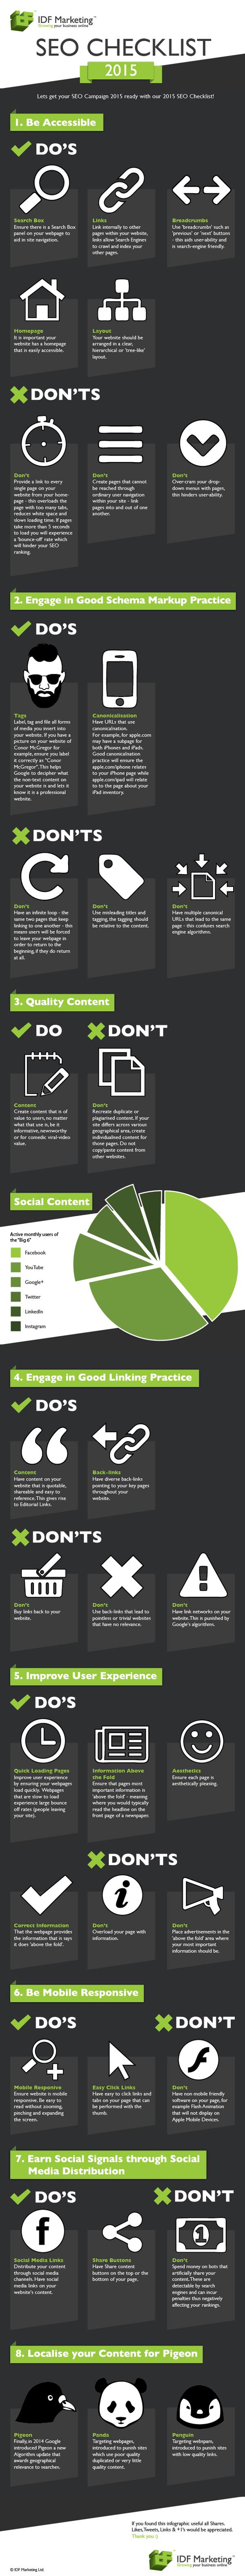 SEO checklist 2015 infographic